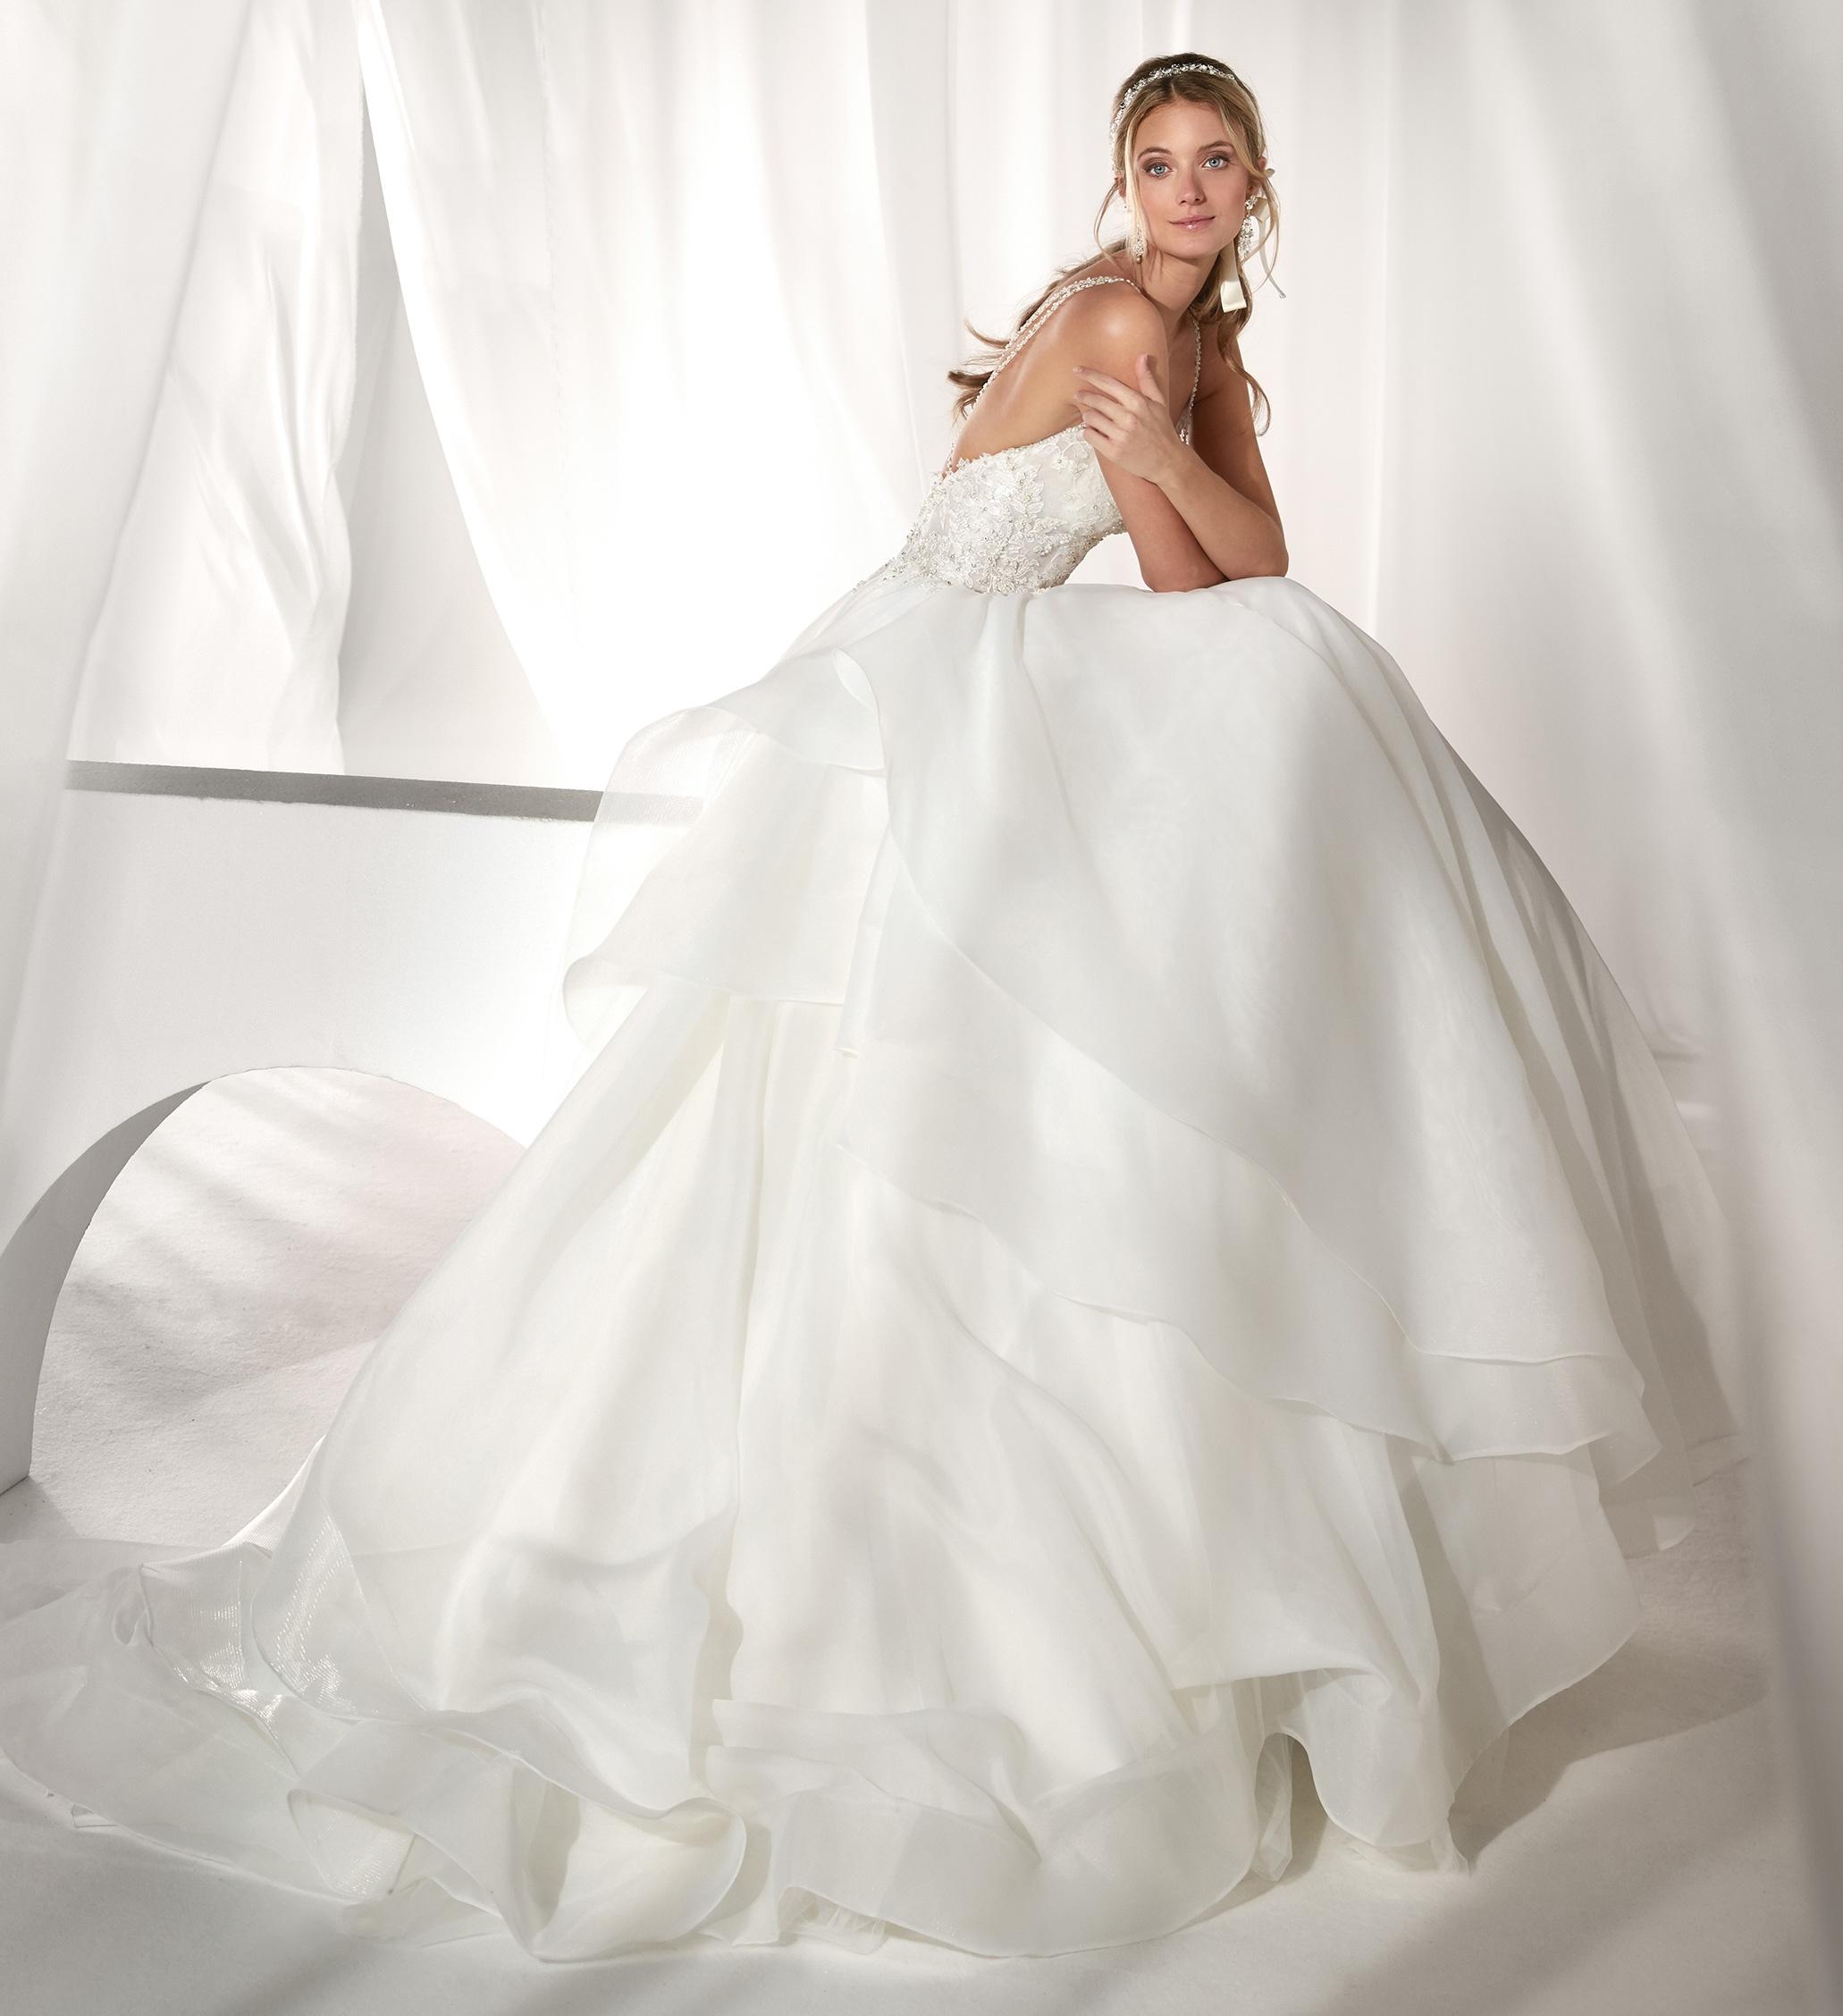 nicole-spose-NIAB19137-Nicole-moda-sposa-2019-648